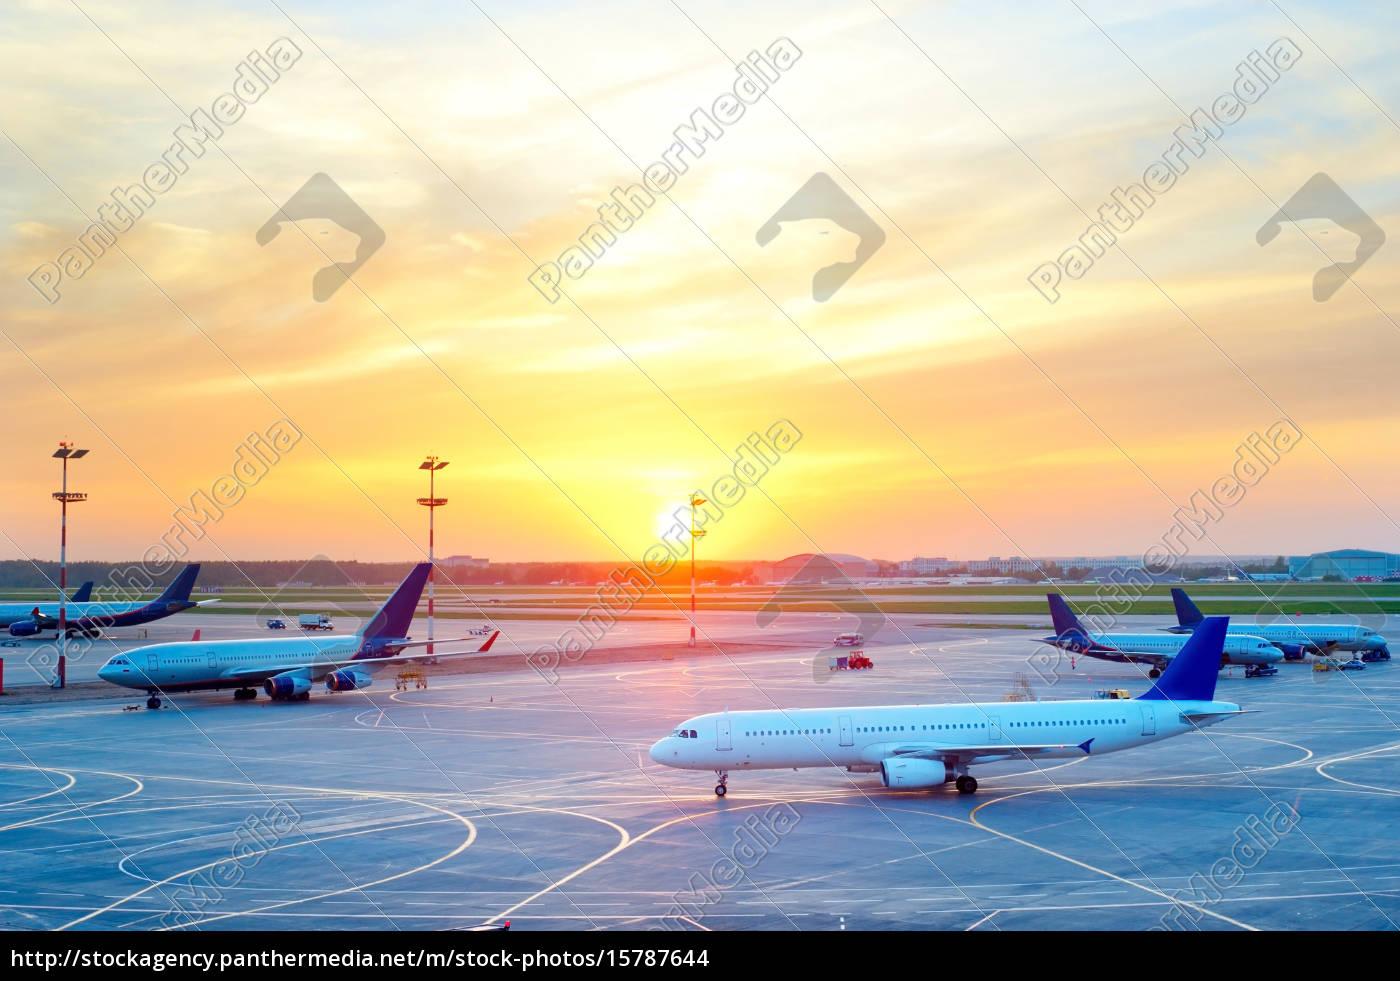 planes, at, airport - 15787644